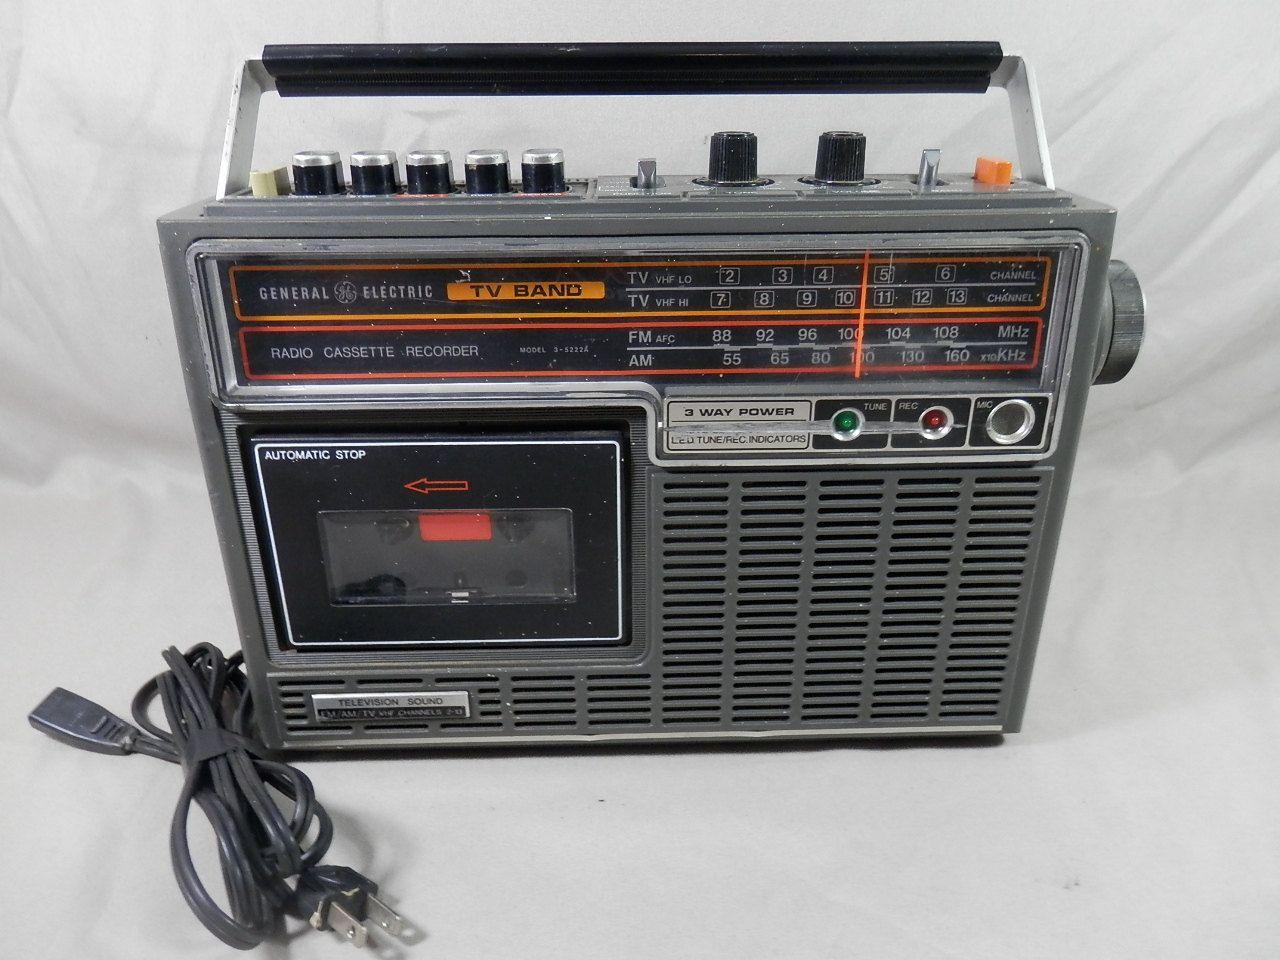 Vintage General Electric Ge Tv Band Am Fm Vhf Radio Cassette Recorder 3 5222a Tv Band Radio Cassette Vintage Electronics